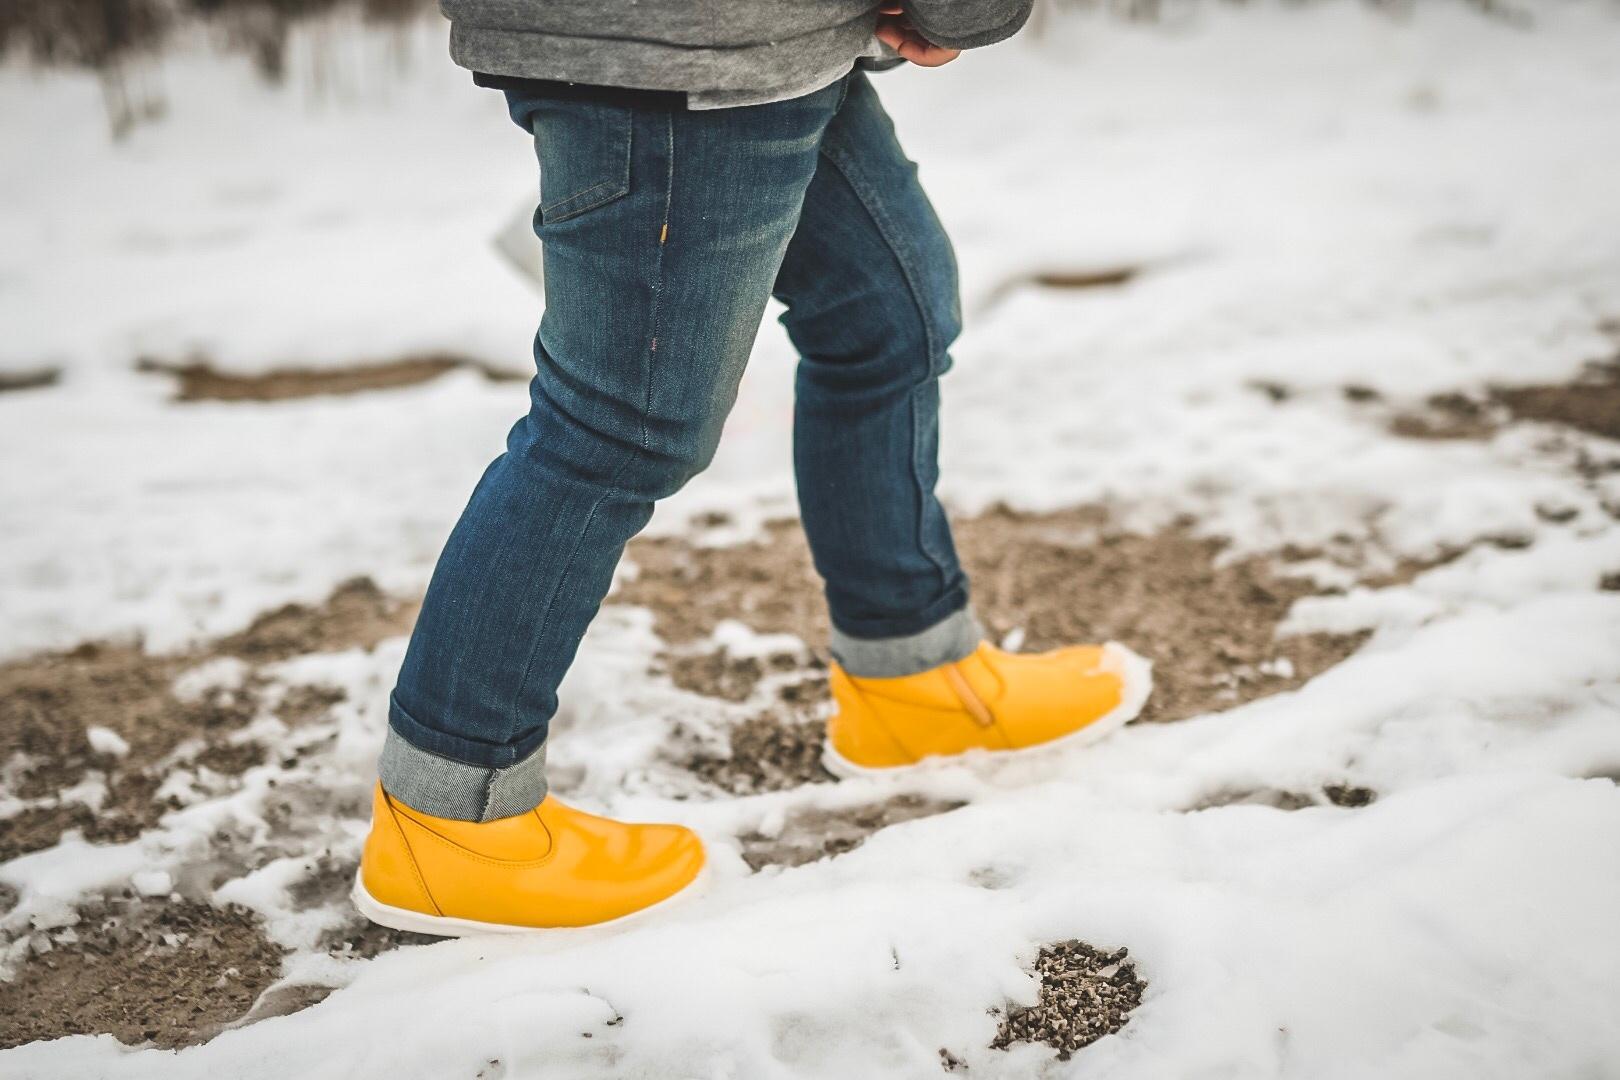 paddington yellow bobux winter boots waterproof snow children alongcameadaleigh